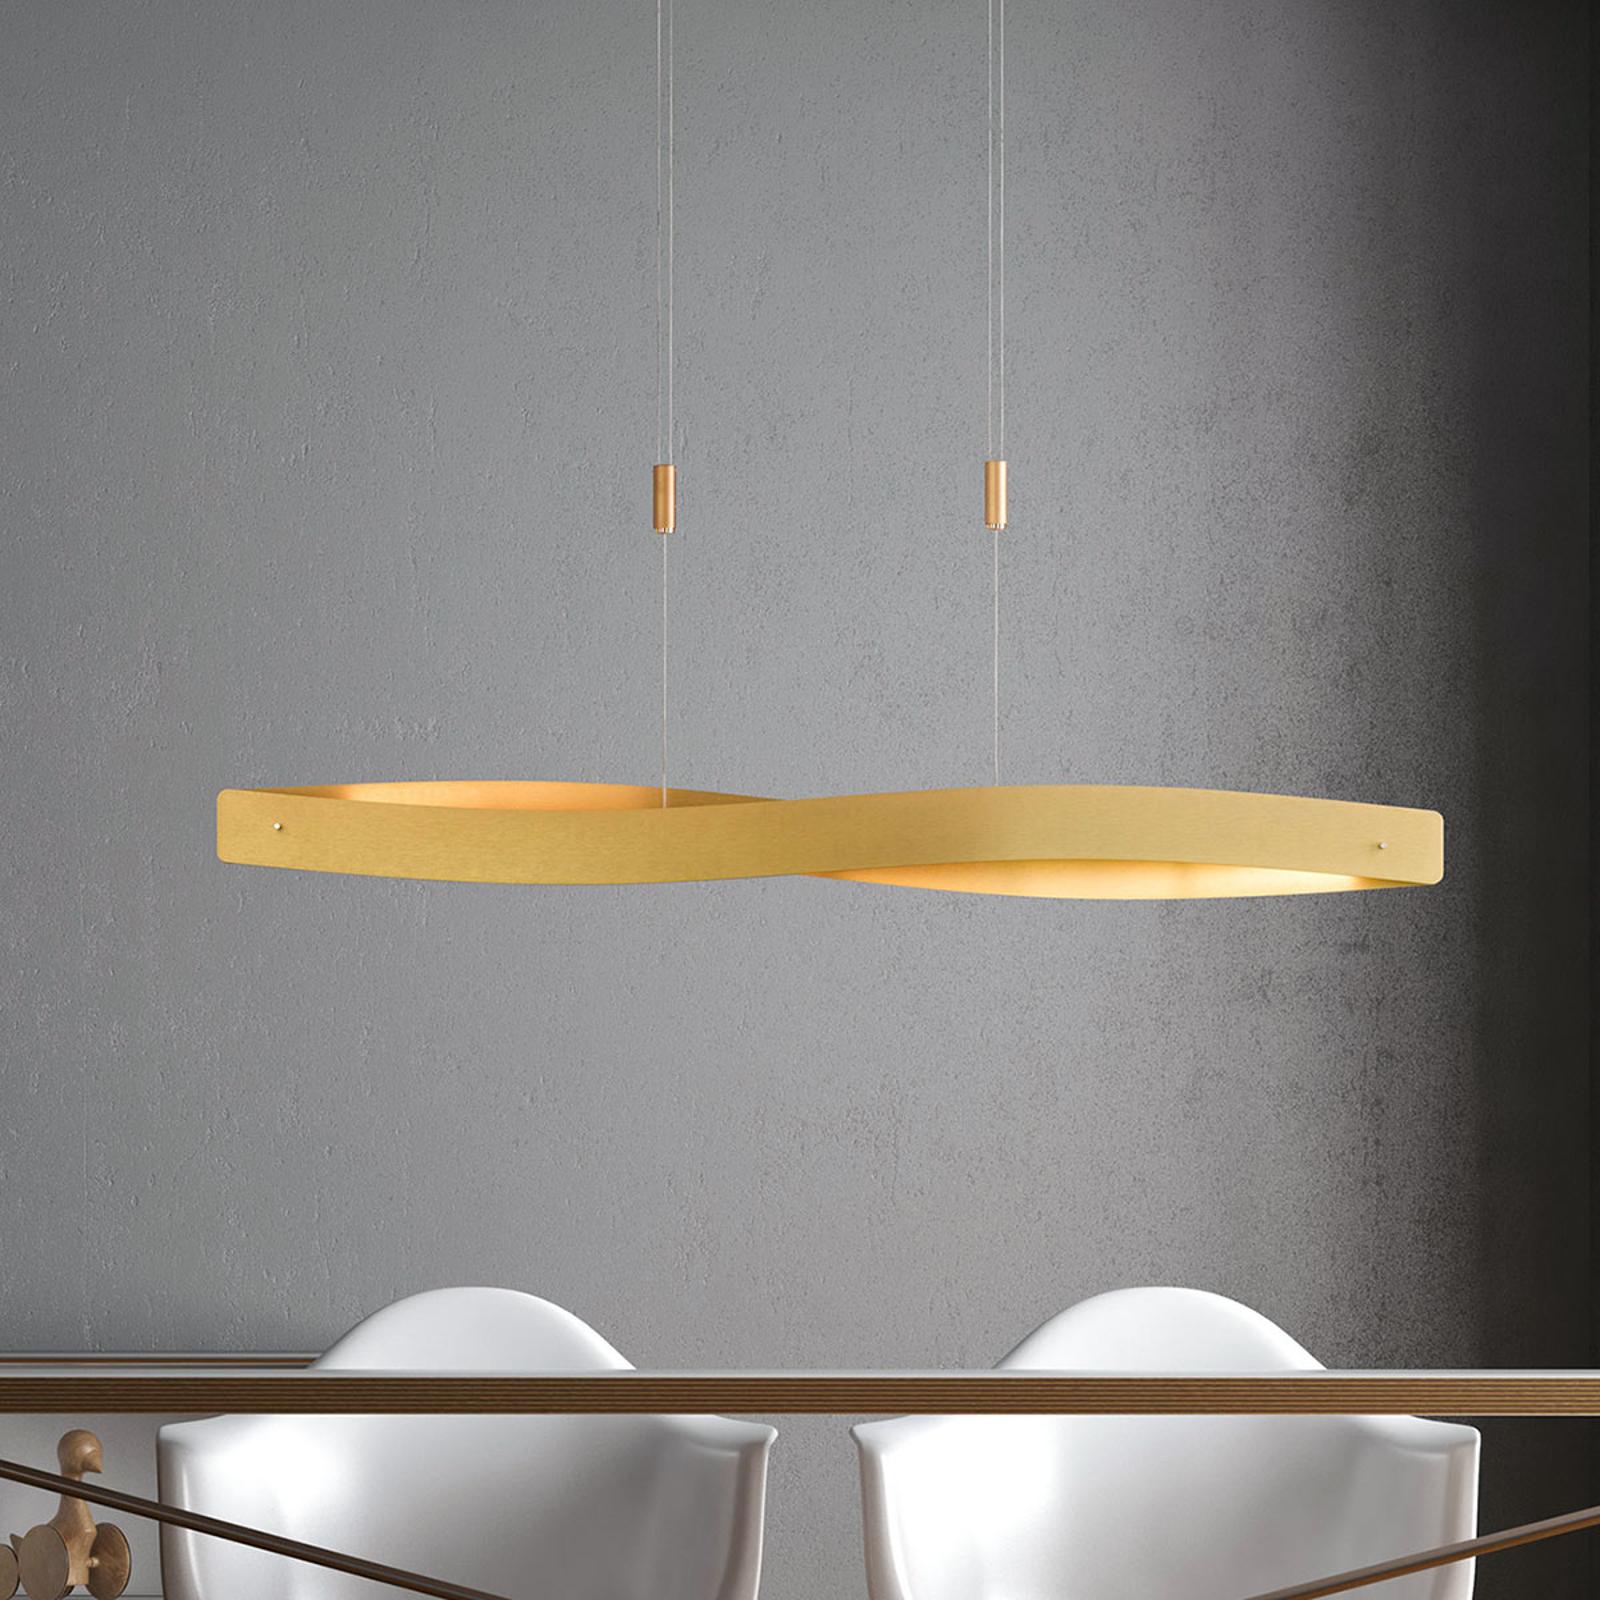 Lucande Lian LED-riippuvalaisin, messinki